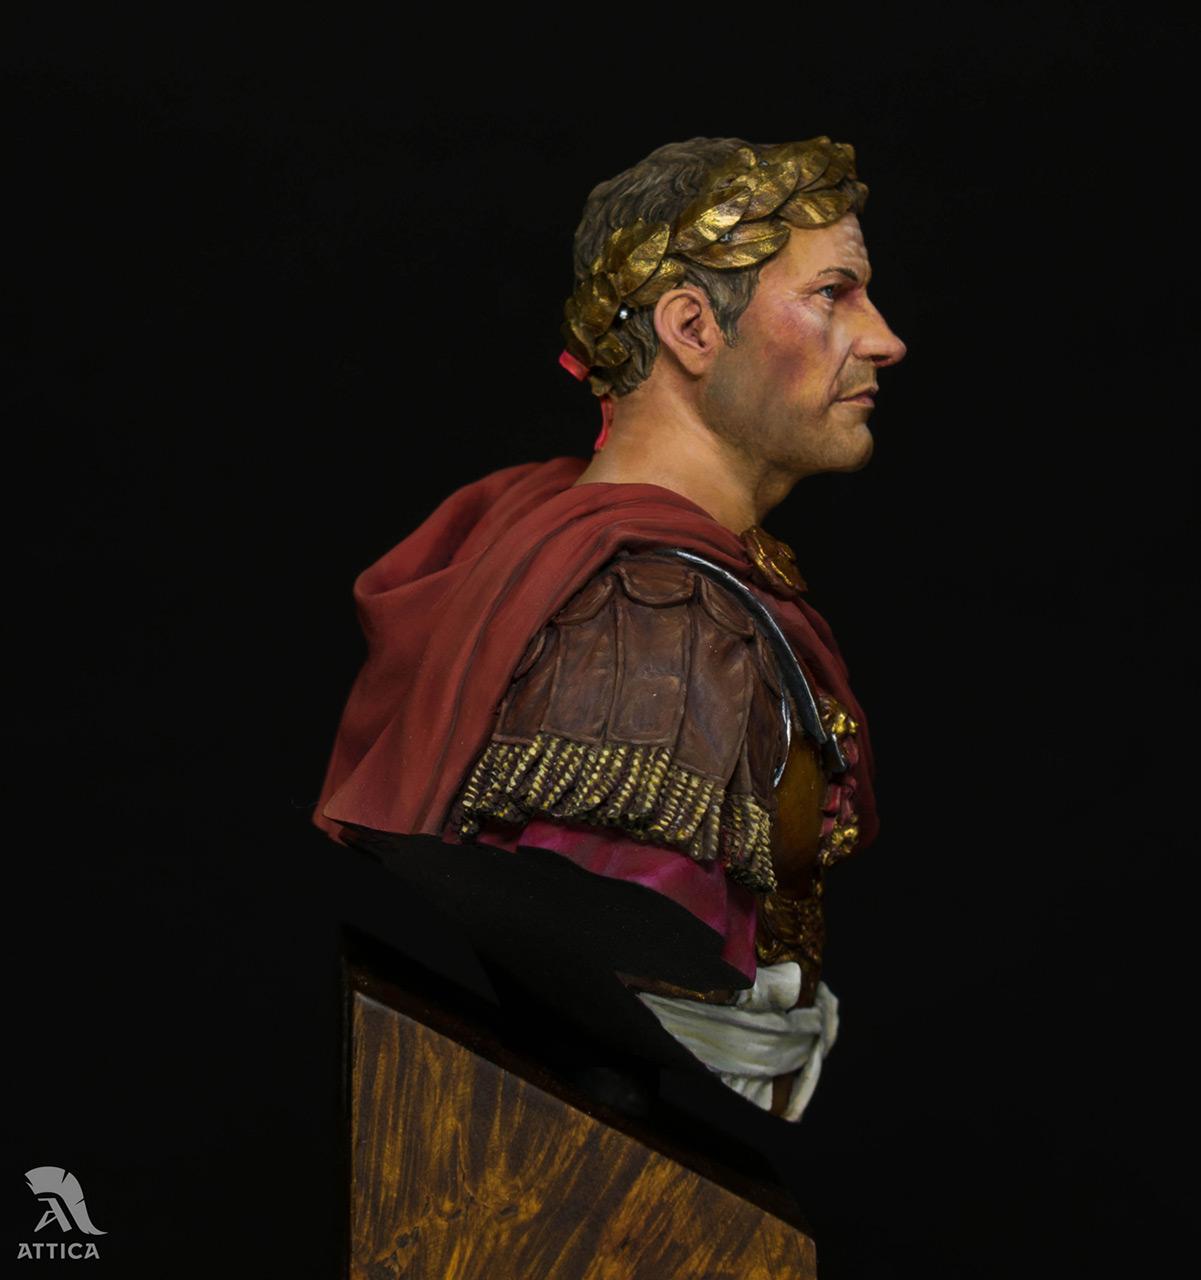 Figures: The Triumpher, photo #6